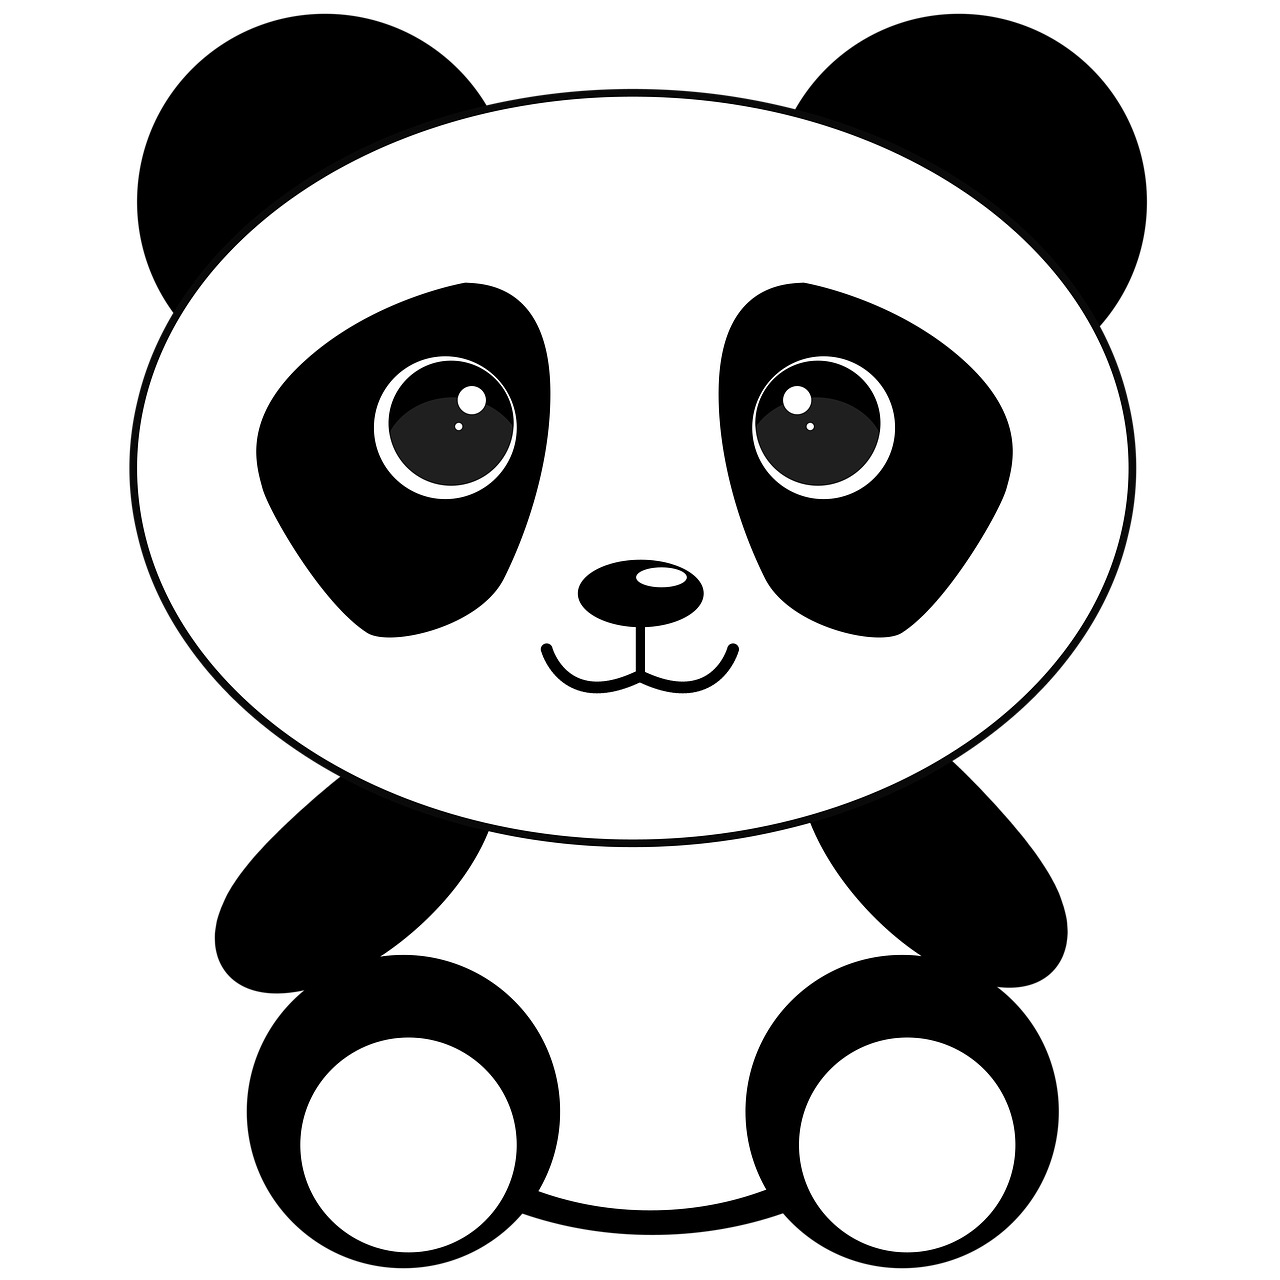 Panda Stickers - 2018 messages sticker-0